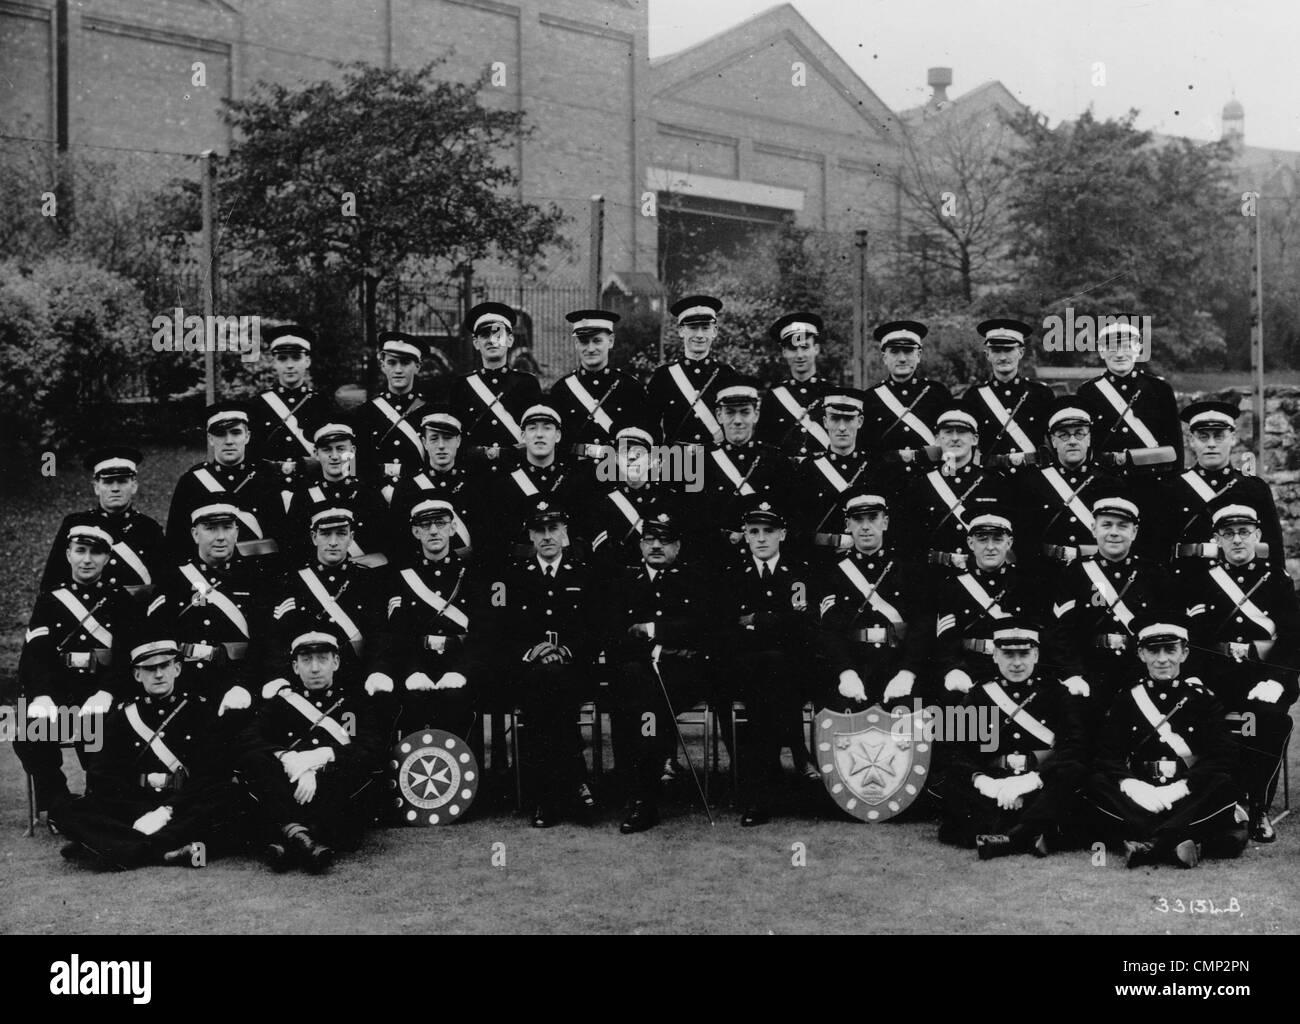 St. John's Ambulance Brigade, GKN Sankey, Wolverhampton, 1940s. The Brigade in Bilston. They were part of the Sankey Stock Photo